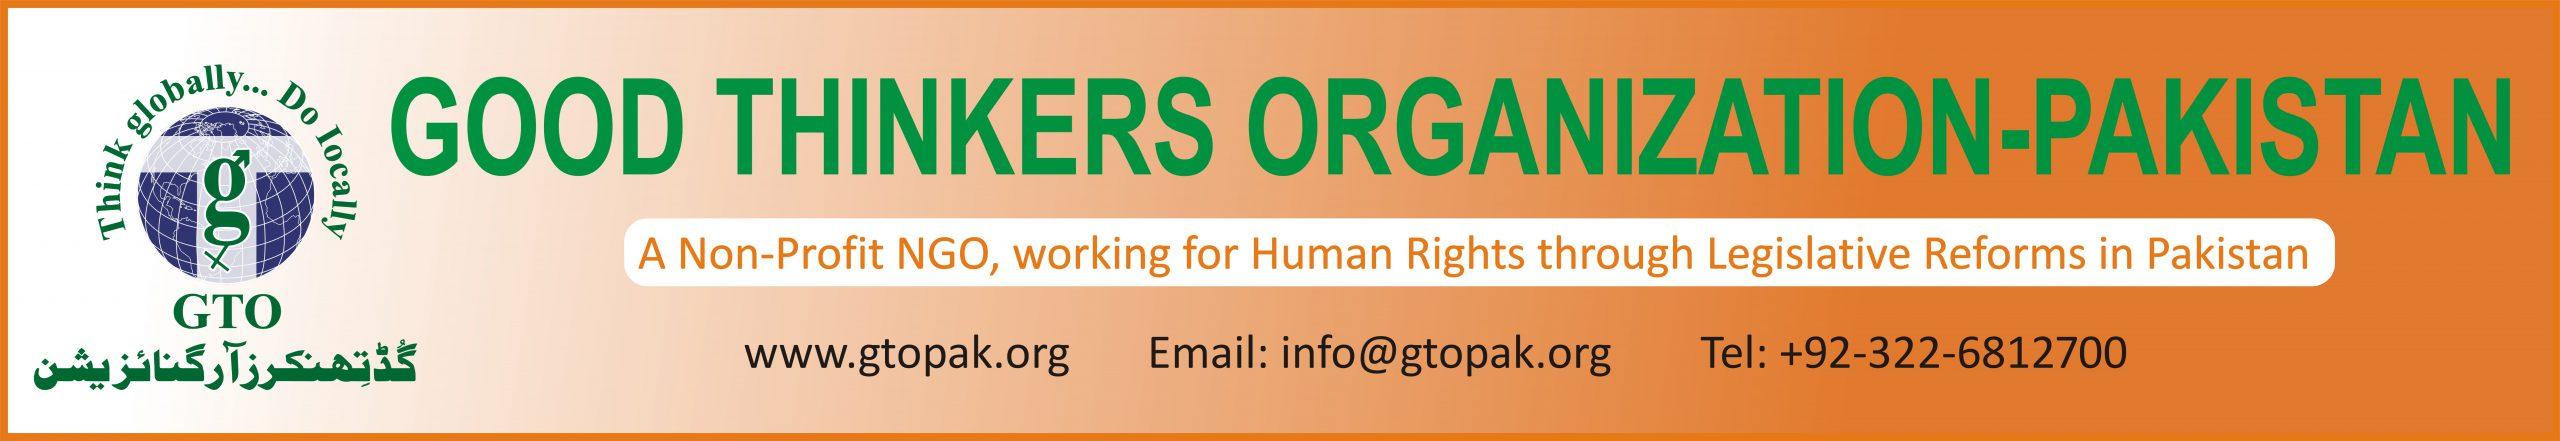 Good Thinkers Organization